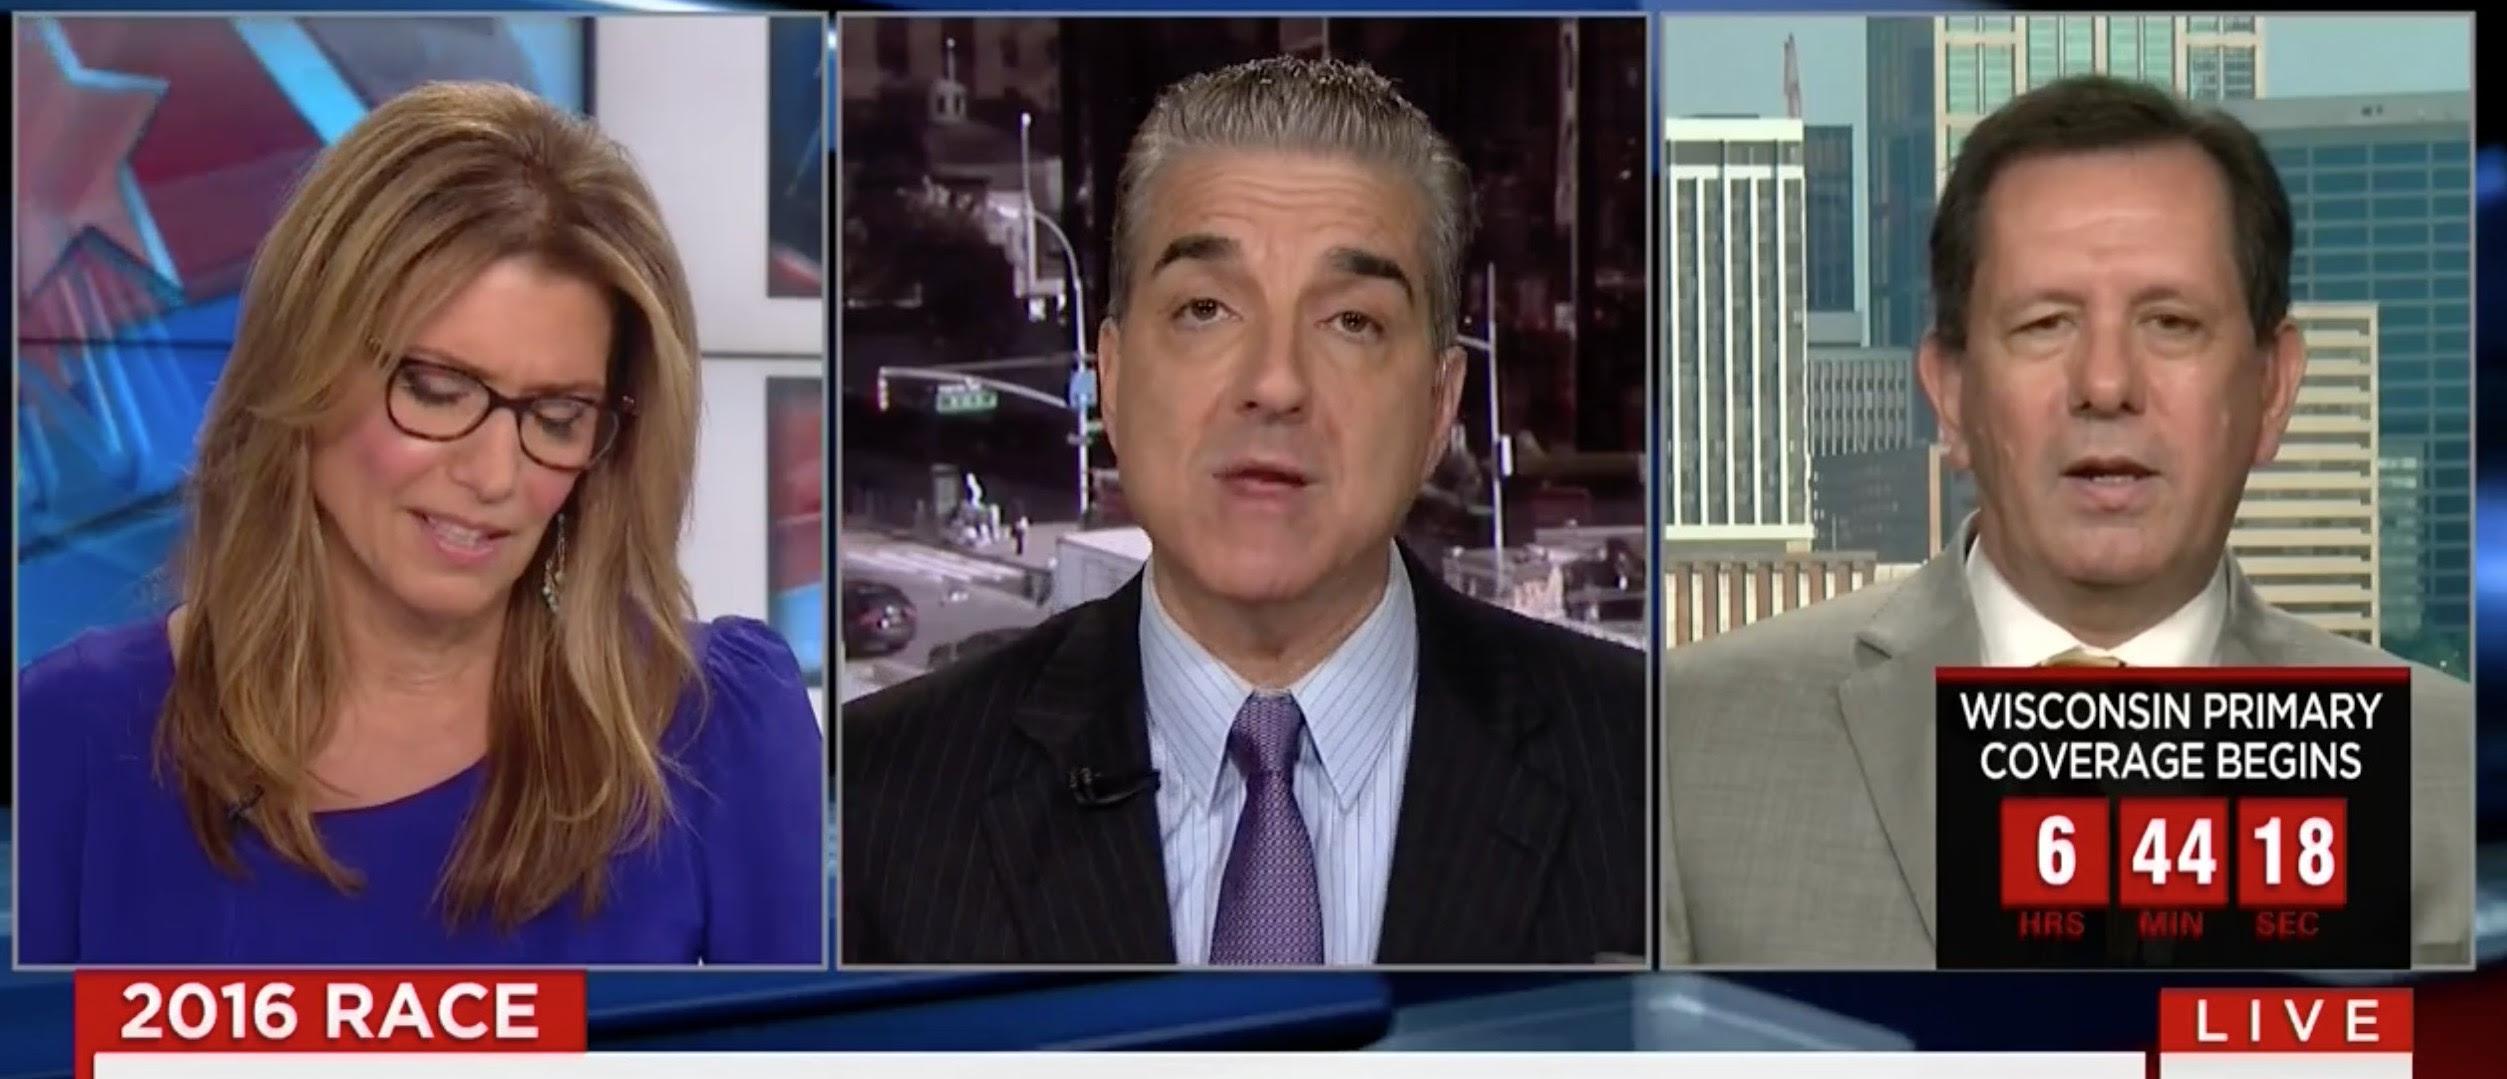 http://dailycaller.com/wp-content/uploads/2016/04/Carol-Costello-Steve-Malzberg-Screen-Shot-CNN-4-5-2016-e1459867728262.jpg